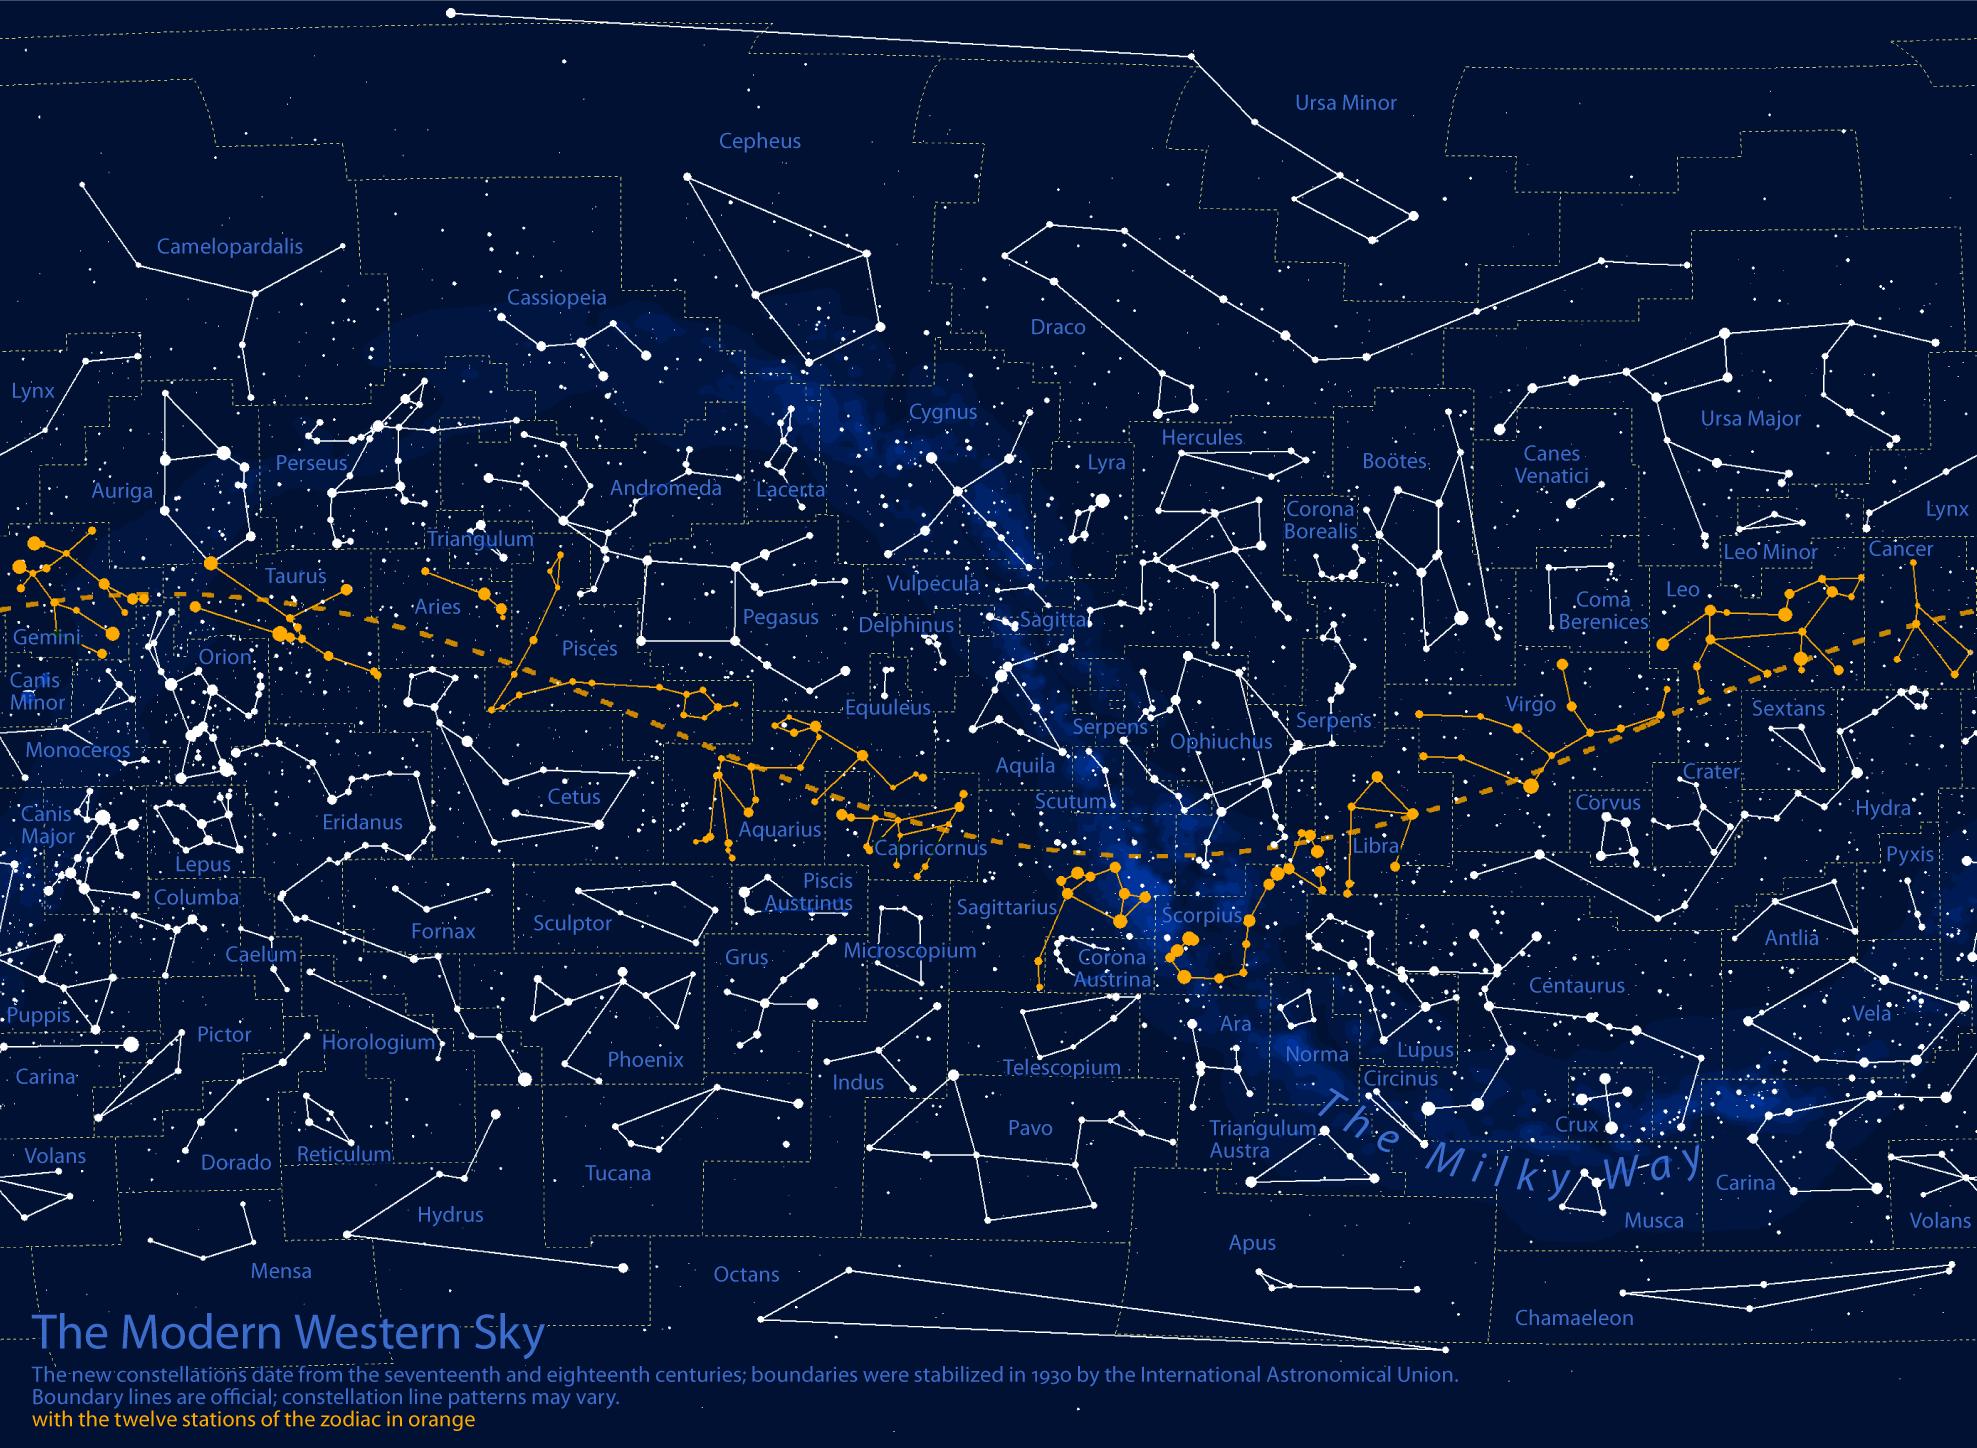 Constellation Wallpaper Ralph Lauren Map geek constellation charts 1977x1448